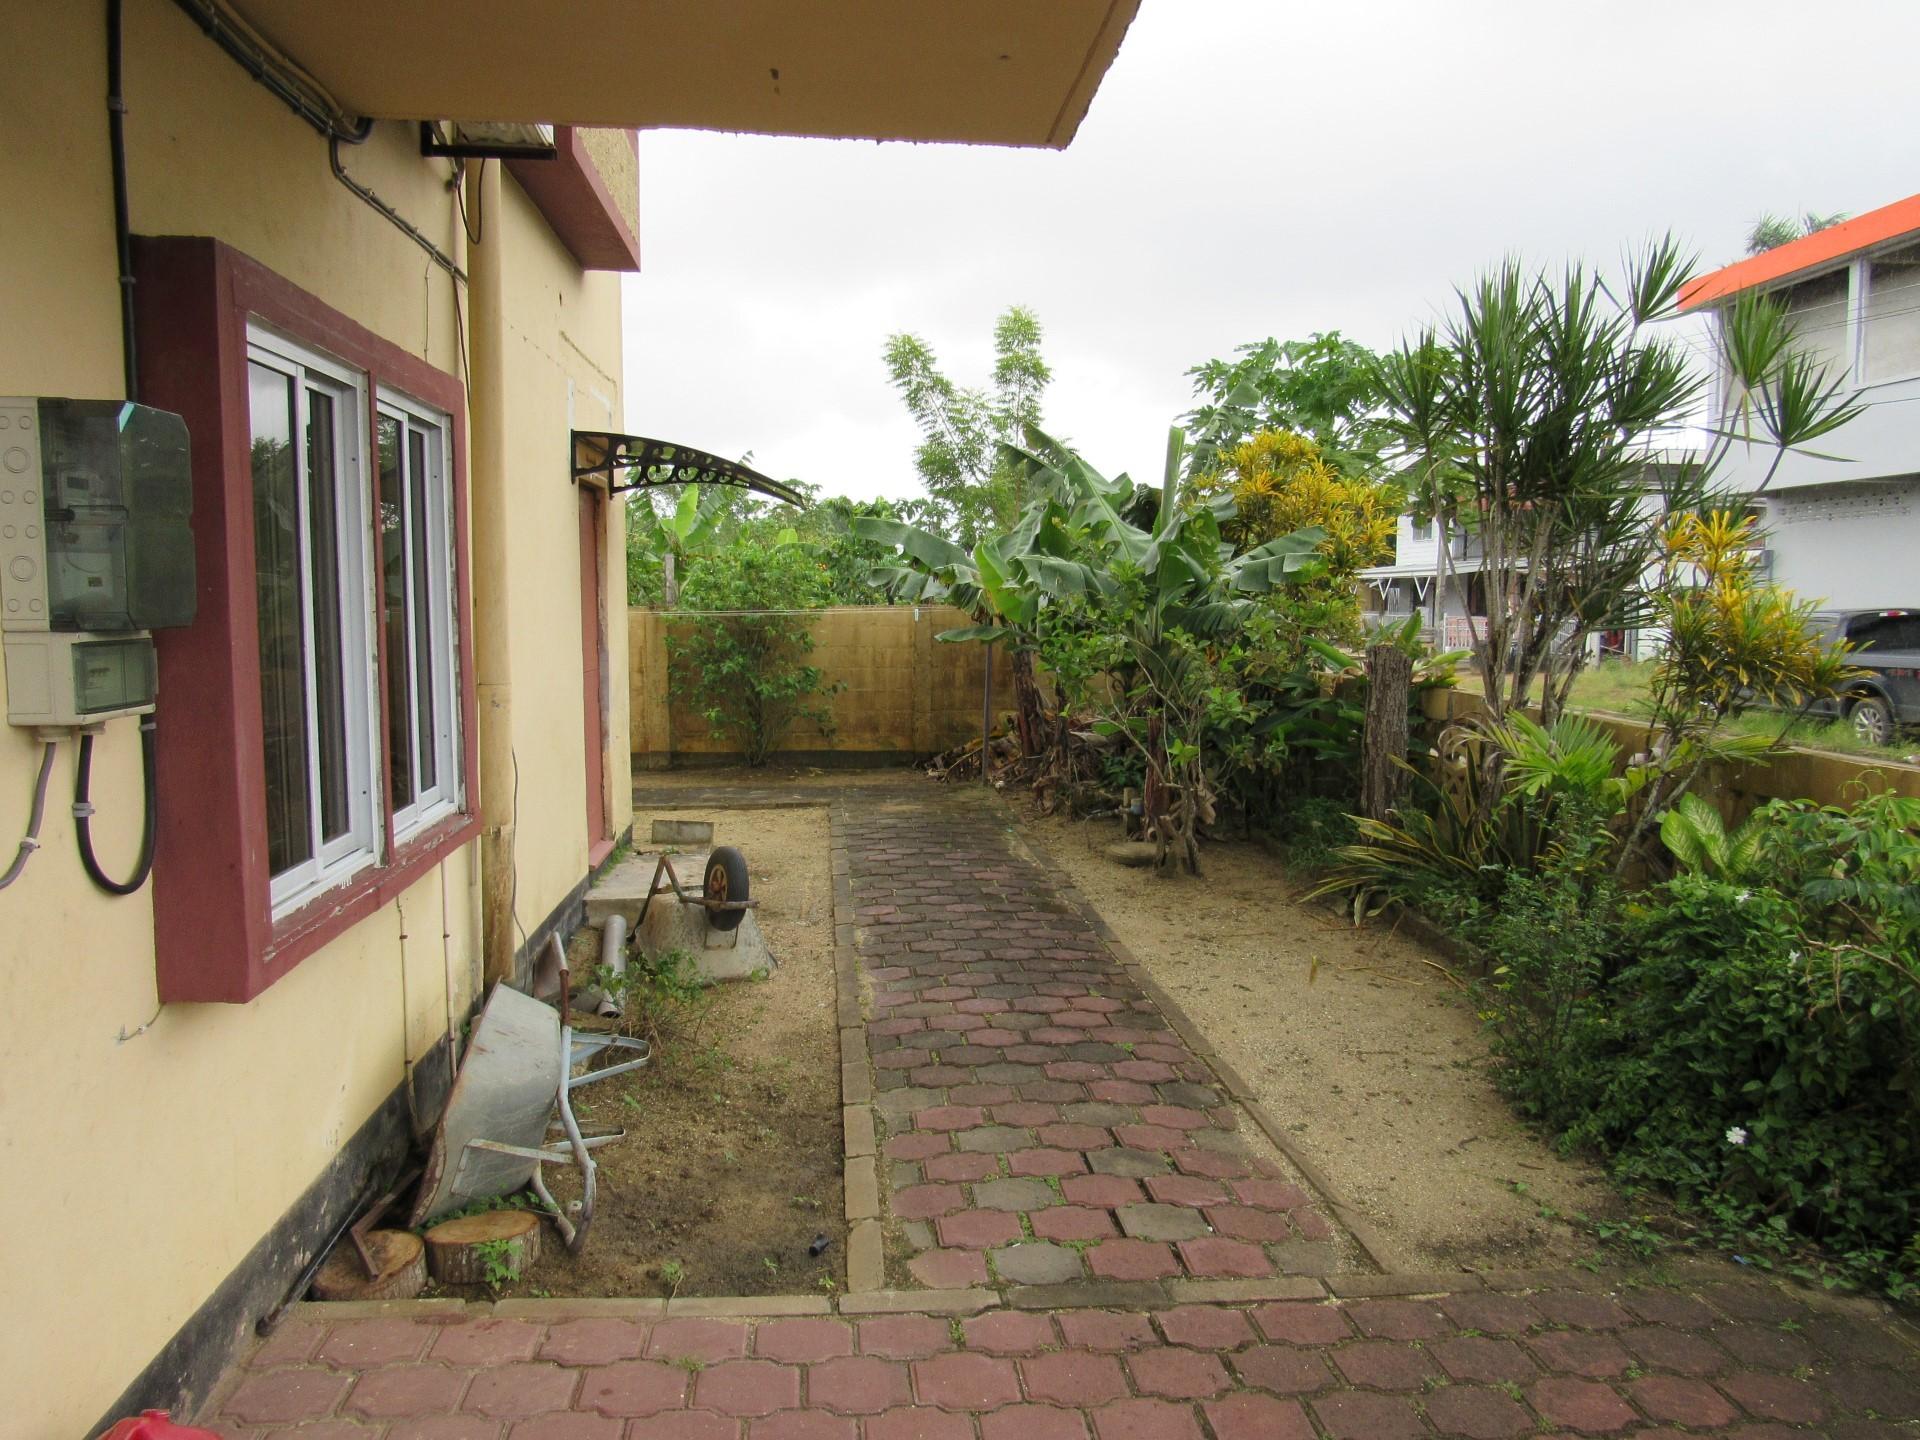 Henkielaan-32-Koopwoning-Terzol-Vastgoed-Paramaribo-Suriname-33